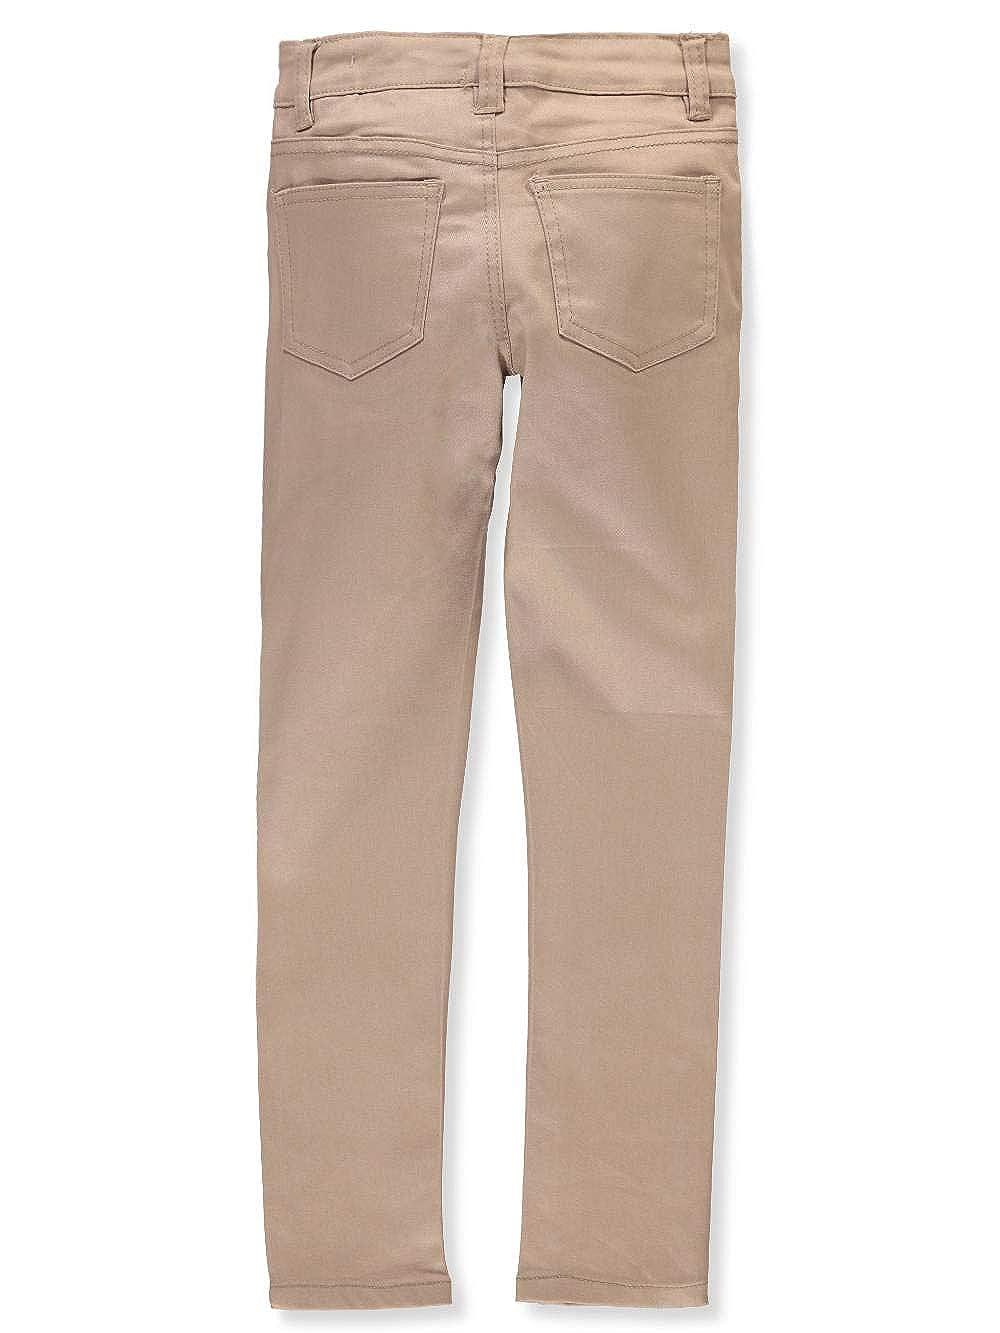 Real Love Girls' Twill Pants